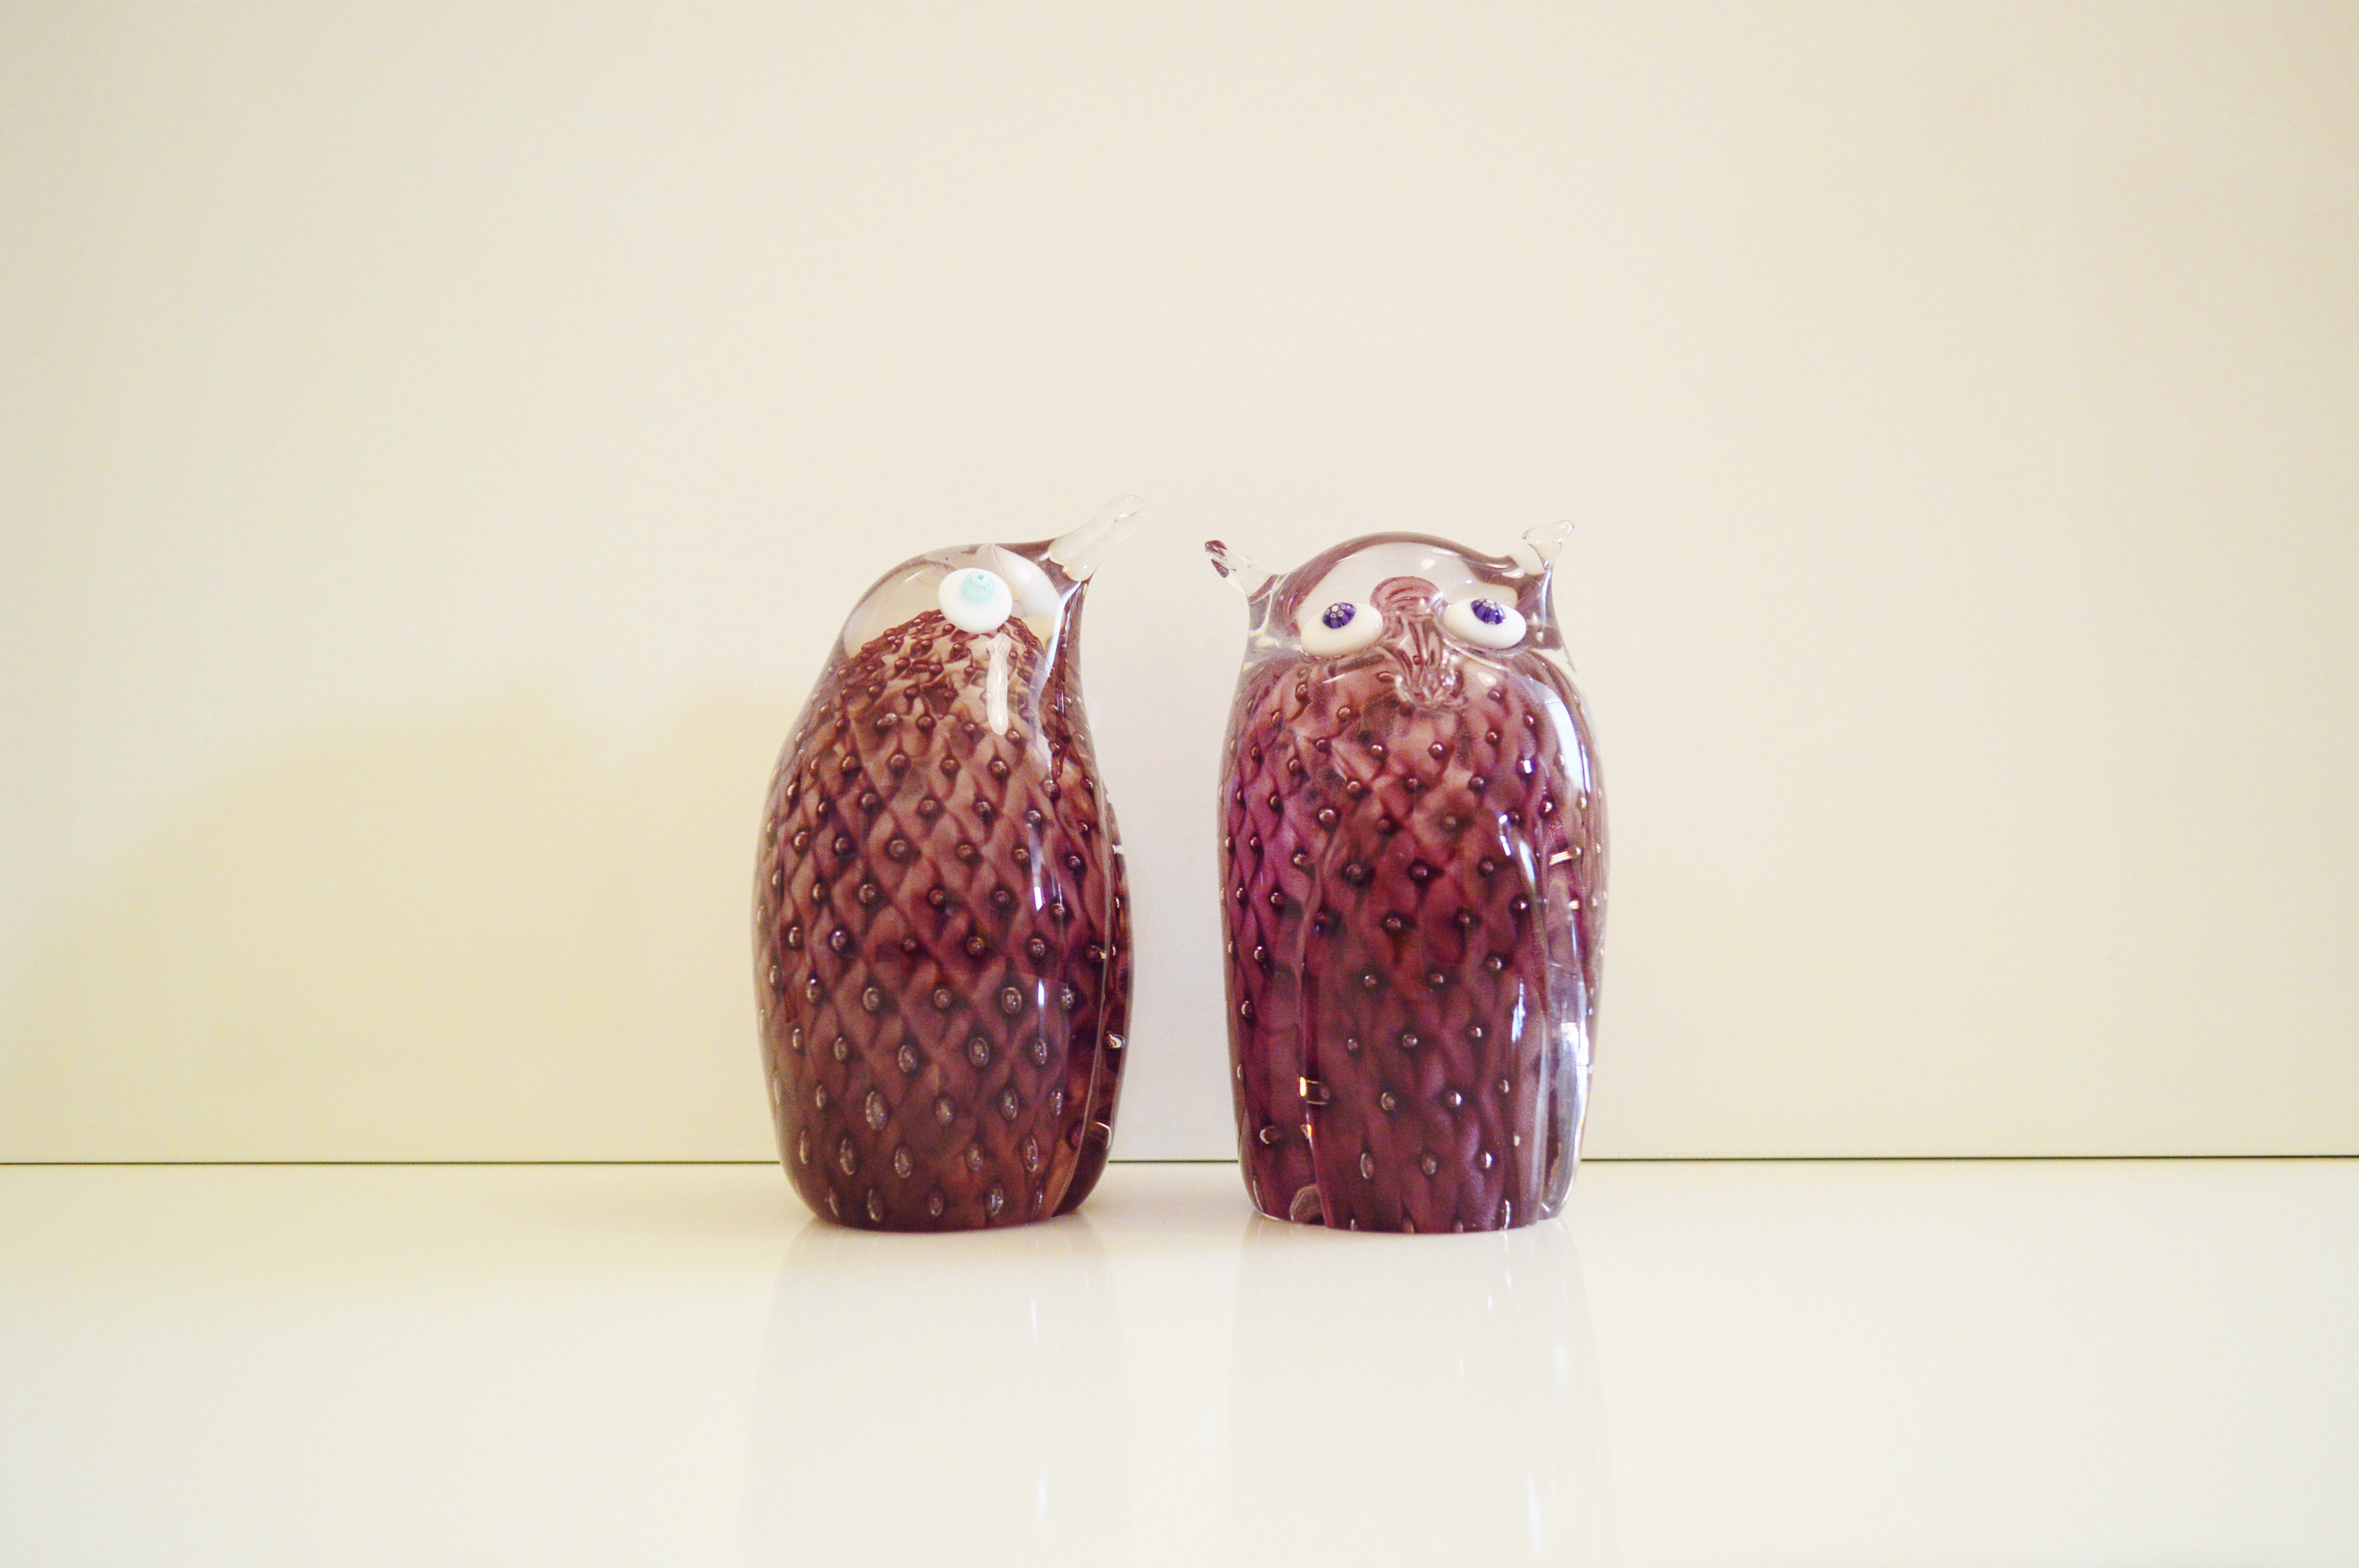 Whitefriars Glass - Rare British Art Glass | London Studio ... Owl